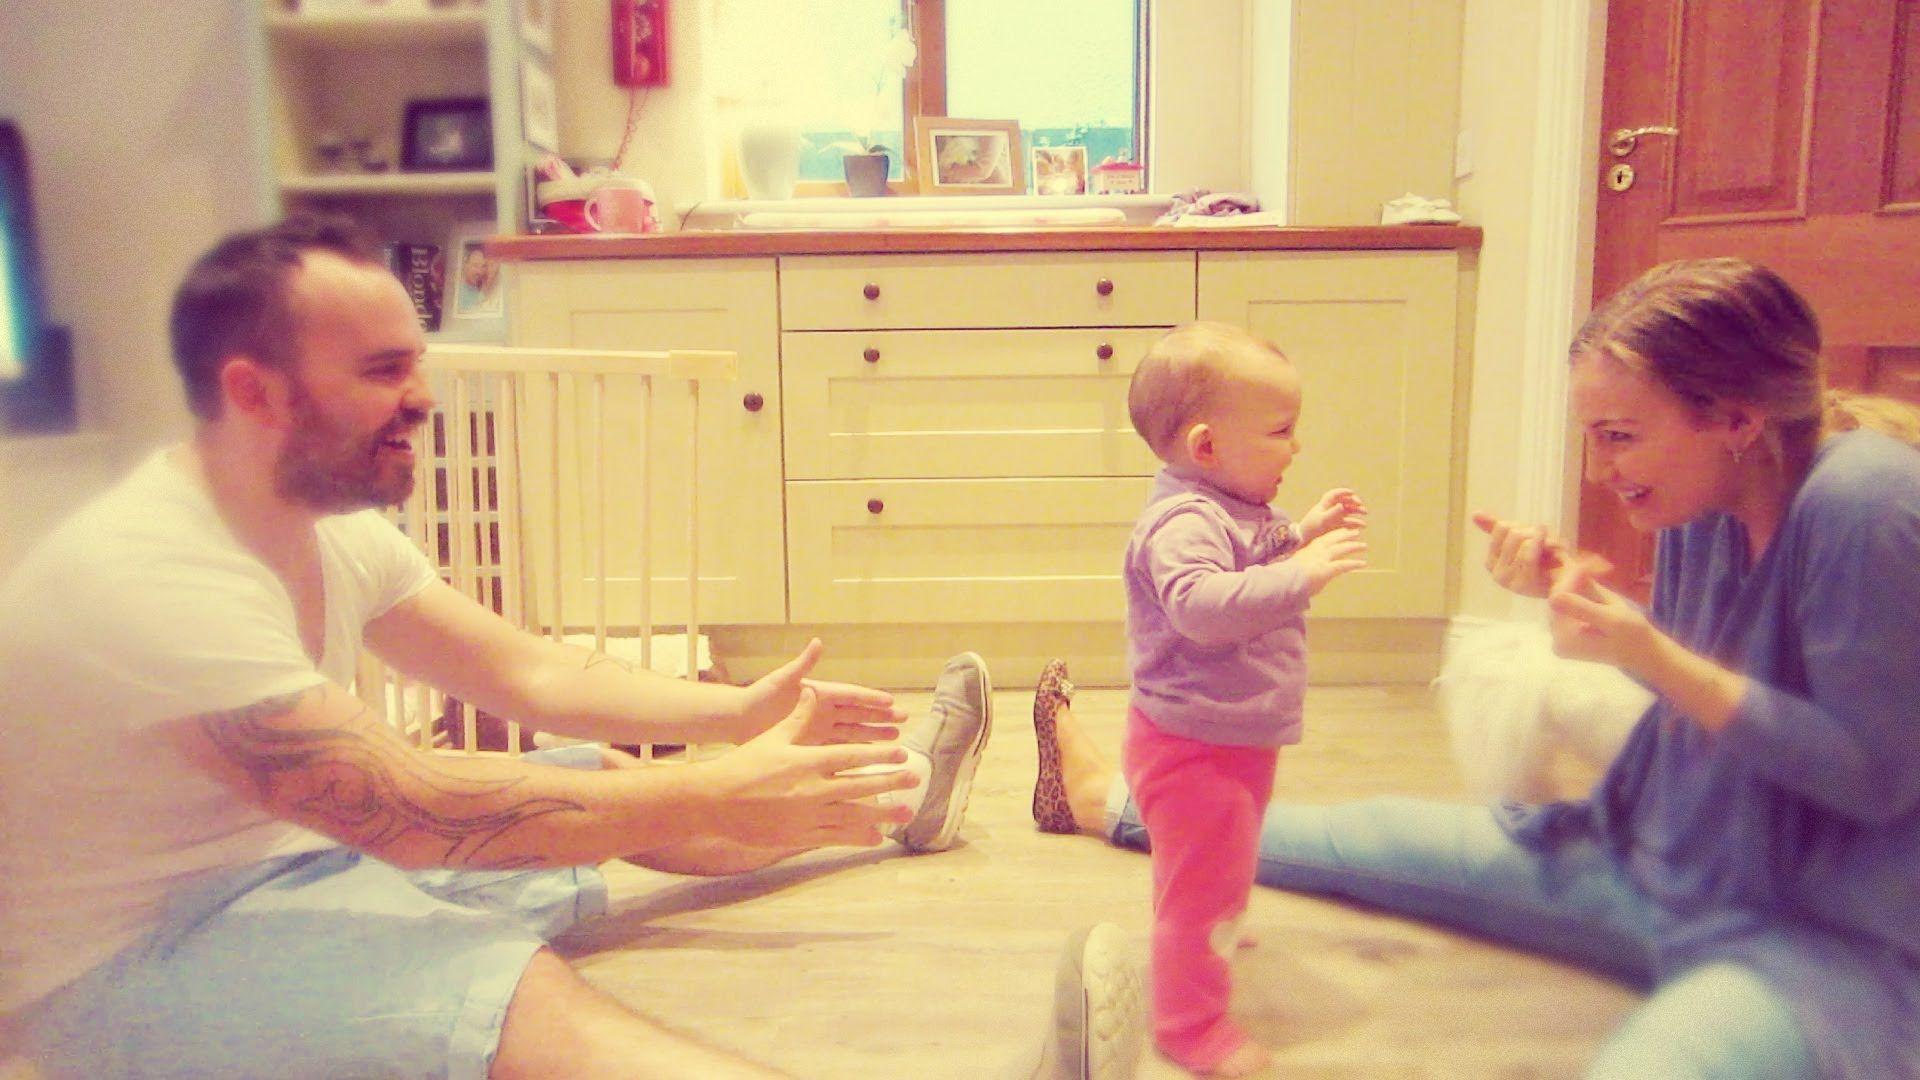 3. Sediakan tempat aman bagi bayi